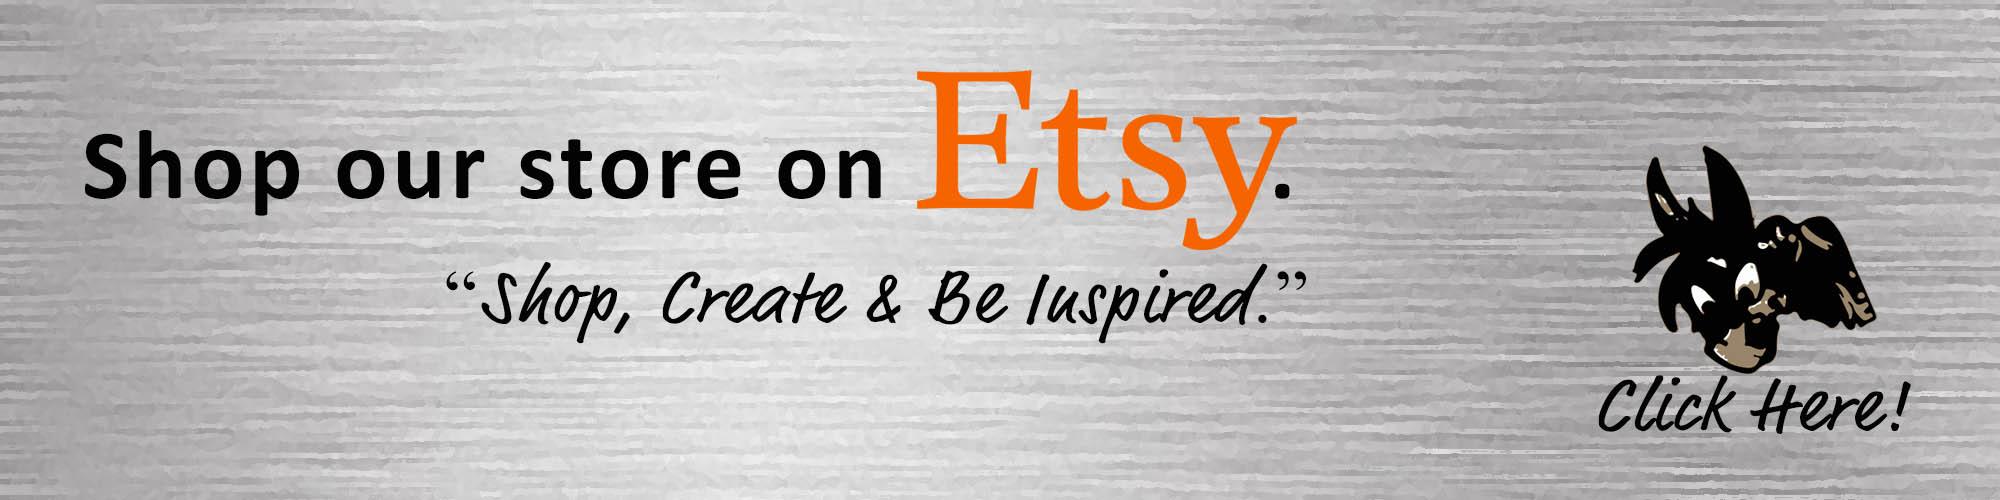 Shop Brown-Donkey Designs on Etsy